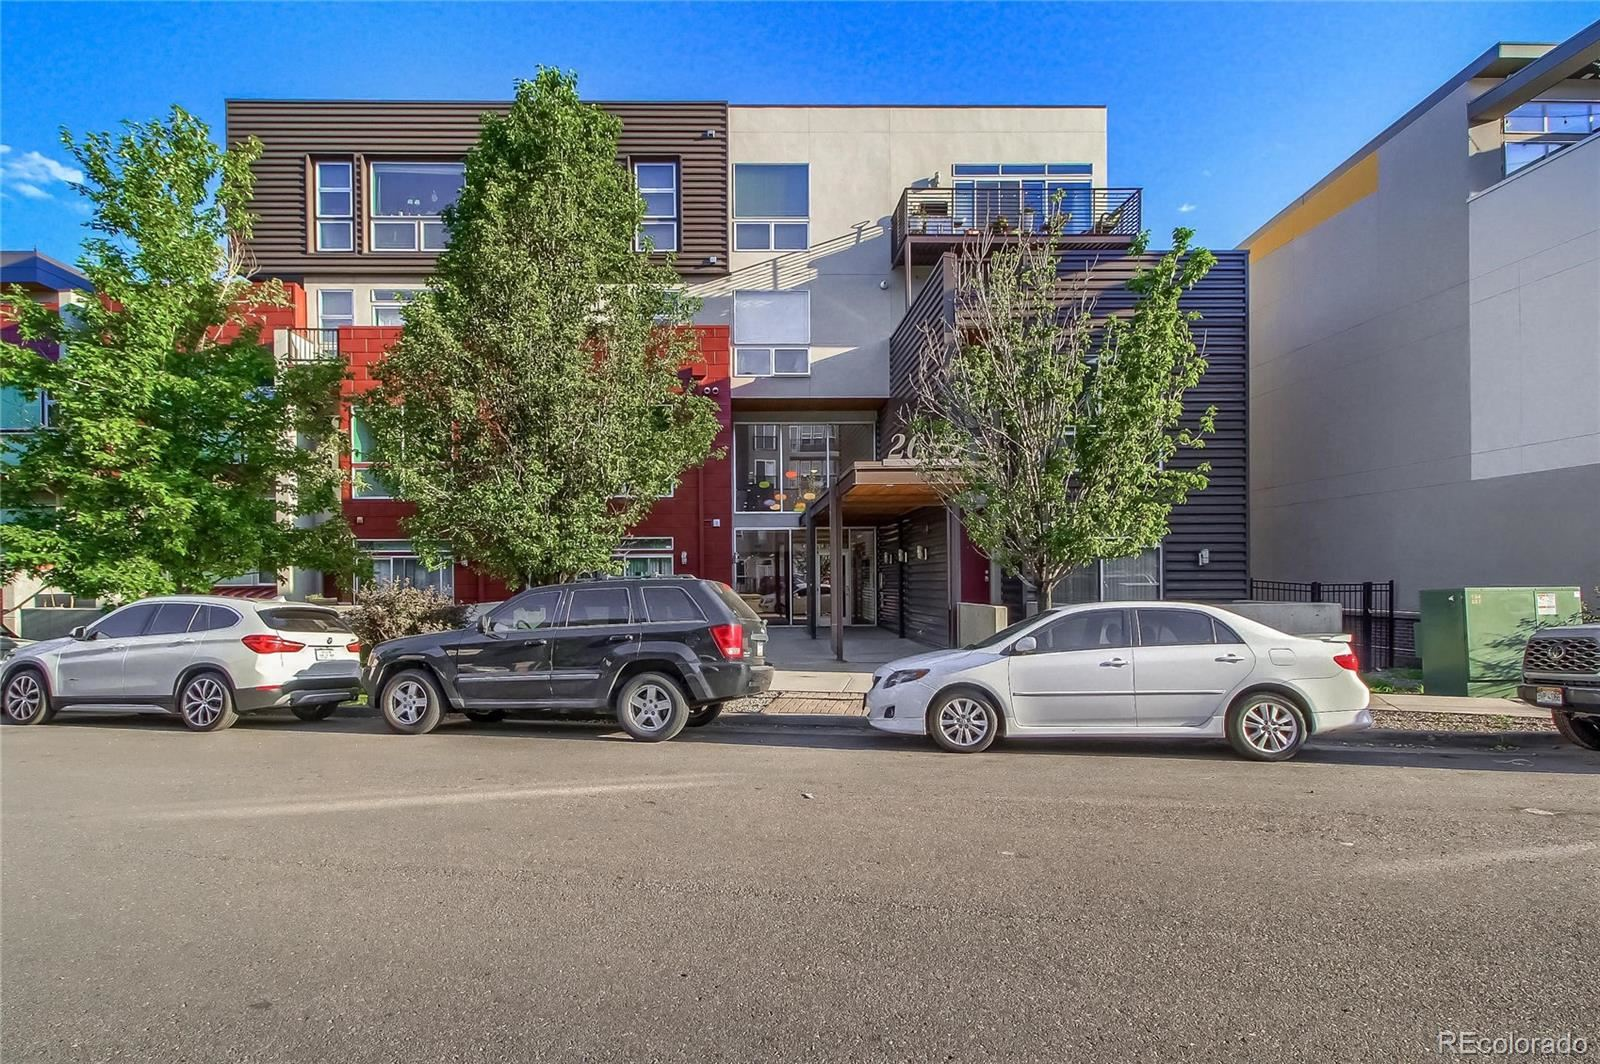 2650 W Front View Drive #105, Denver, CO 80211 - #: 7178614